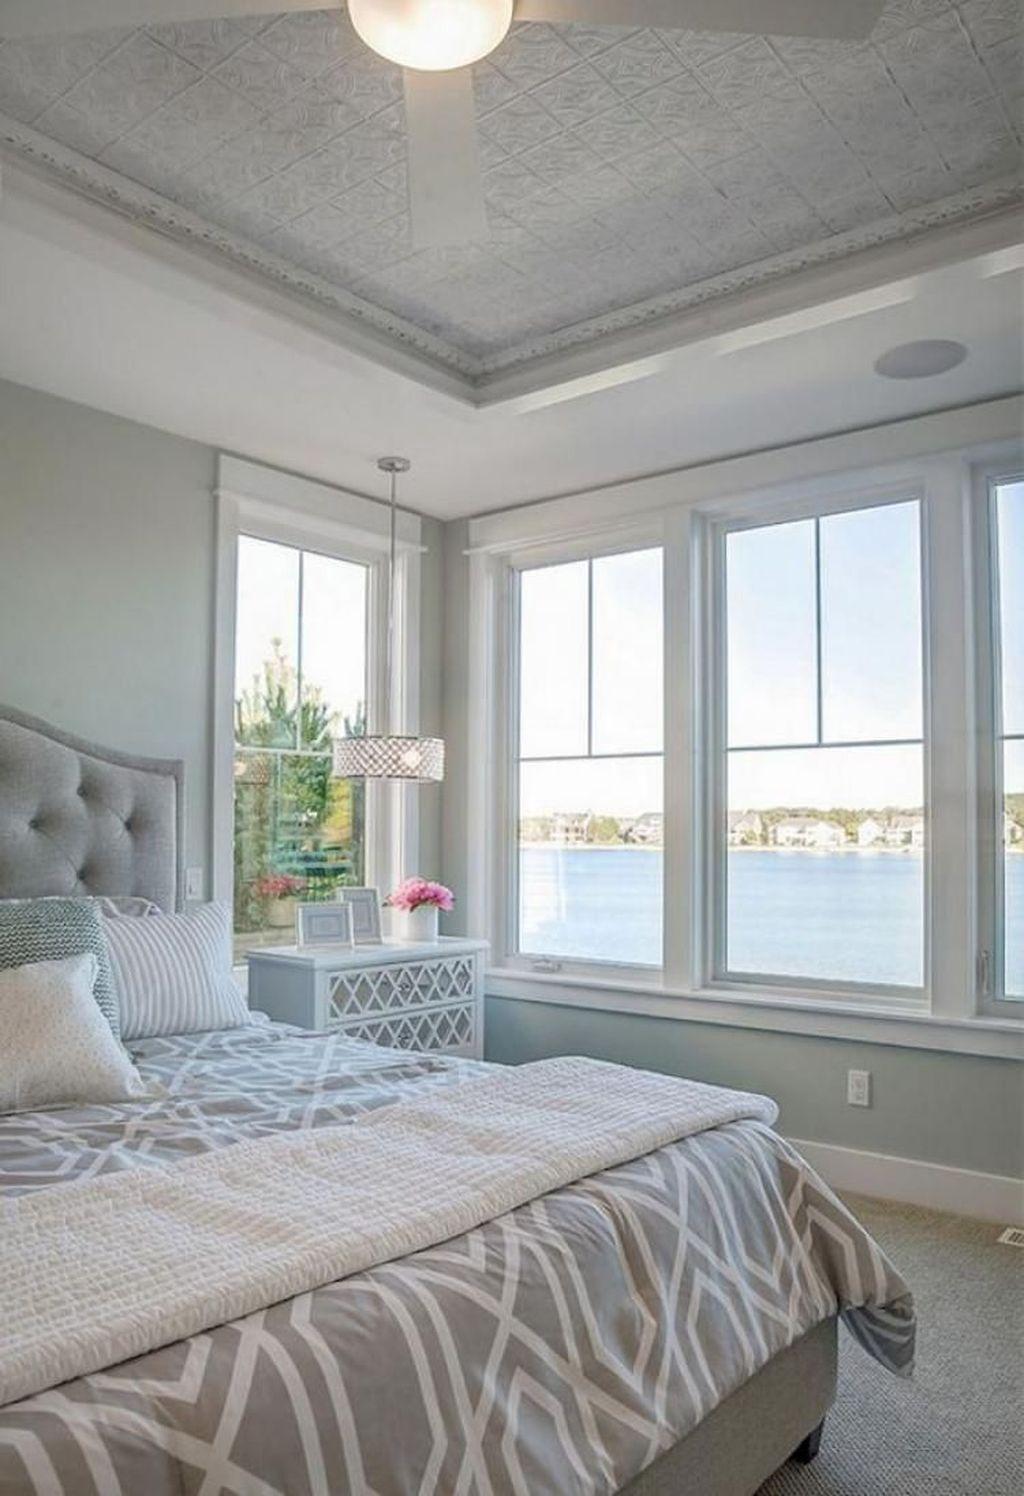 34 Cozy Lake House Bedroom Decorating Ideas Beach House Interior